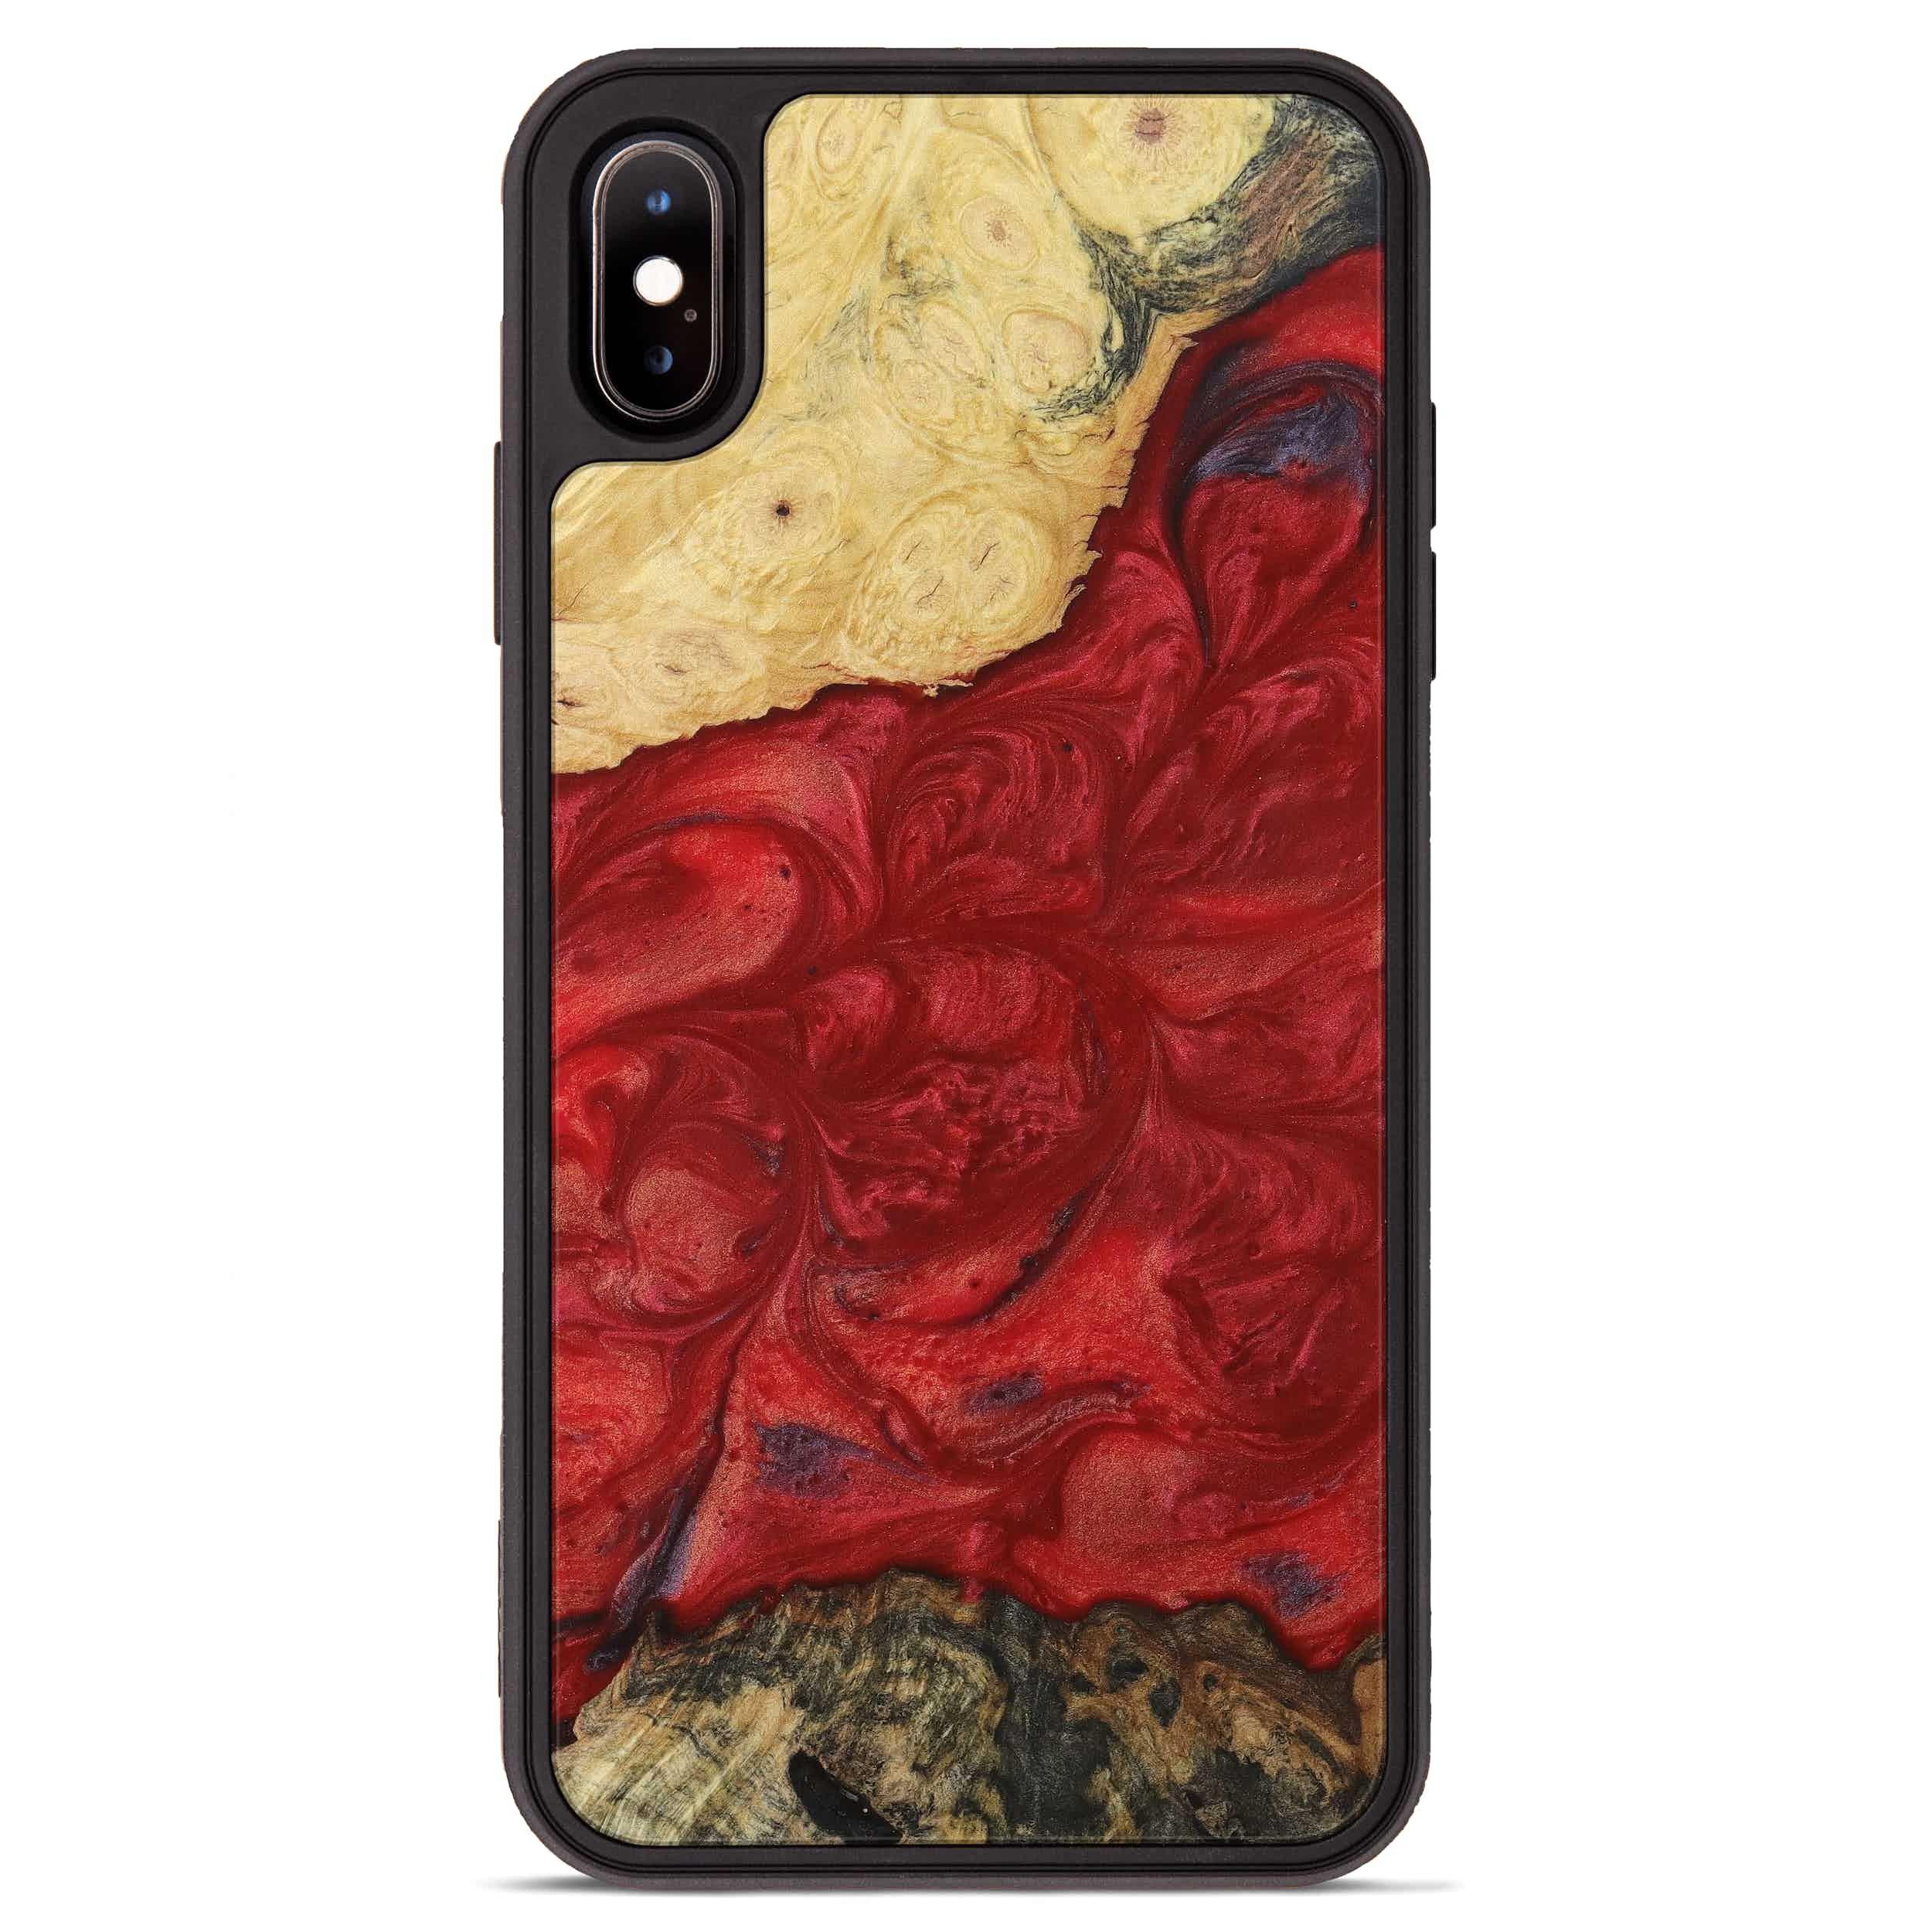 iPhone Xs Max Wood+Resin Phone Case - Cortney (Dark Red, 395196)